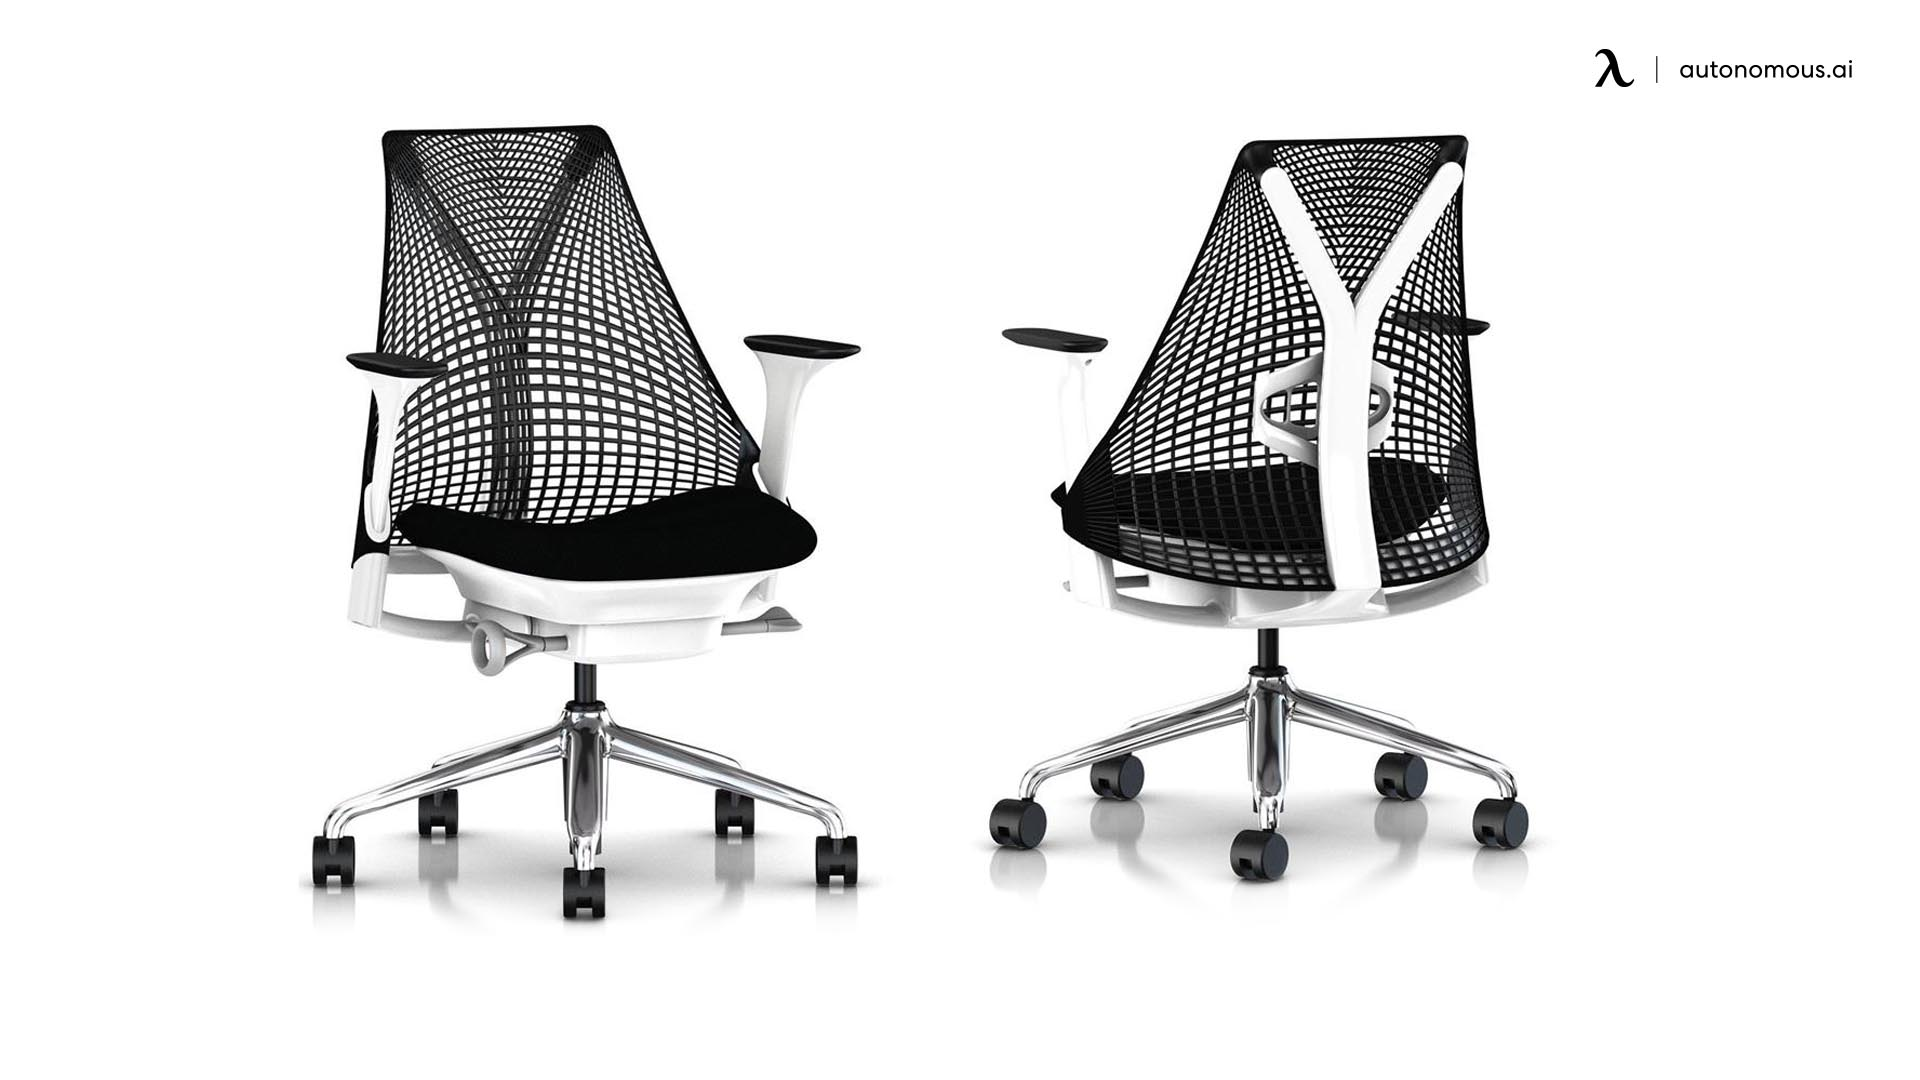 Sayl Chair - ergonomic chair home office